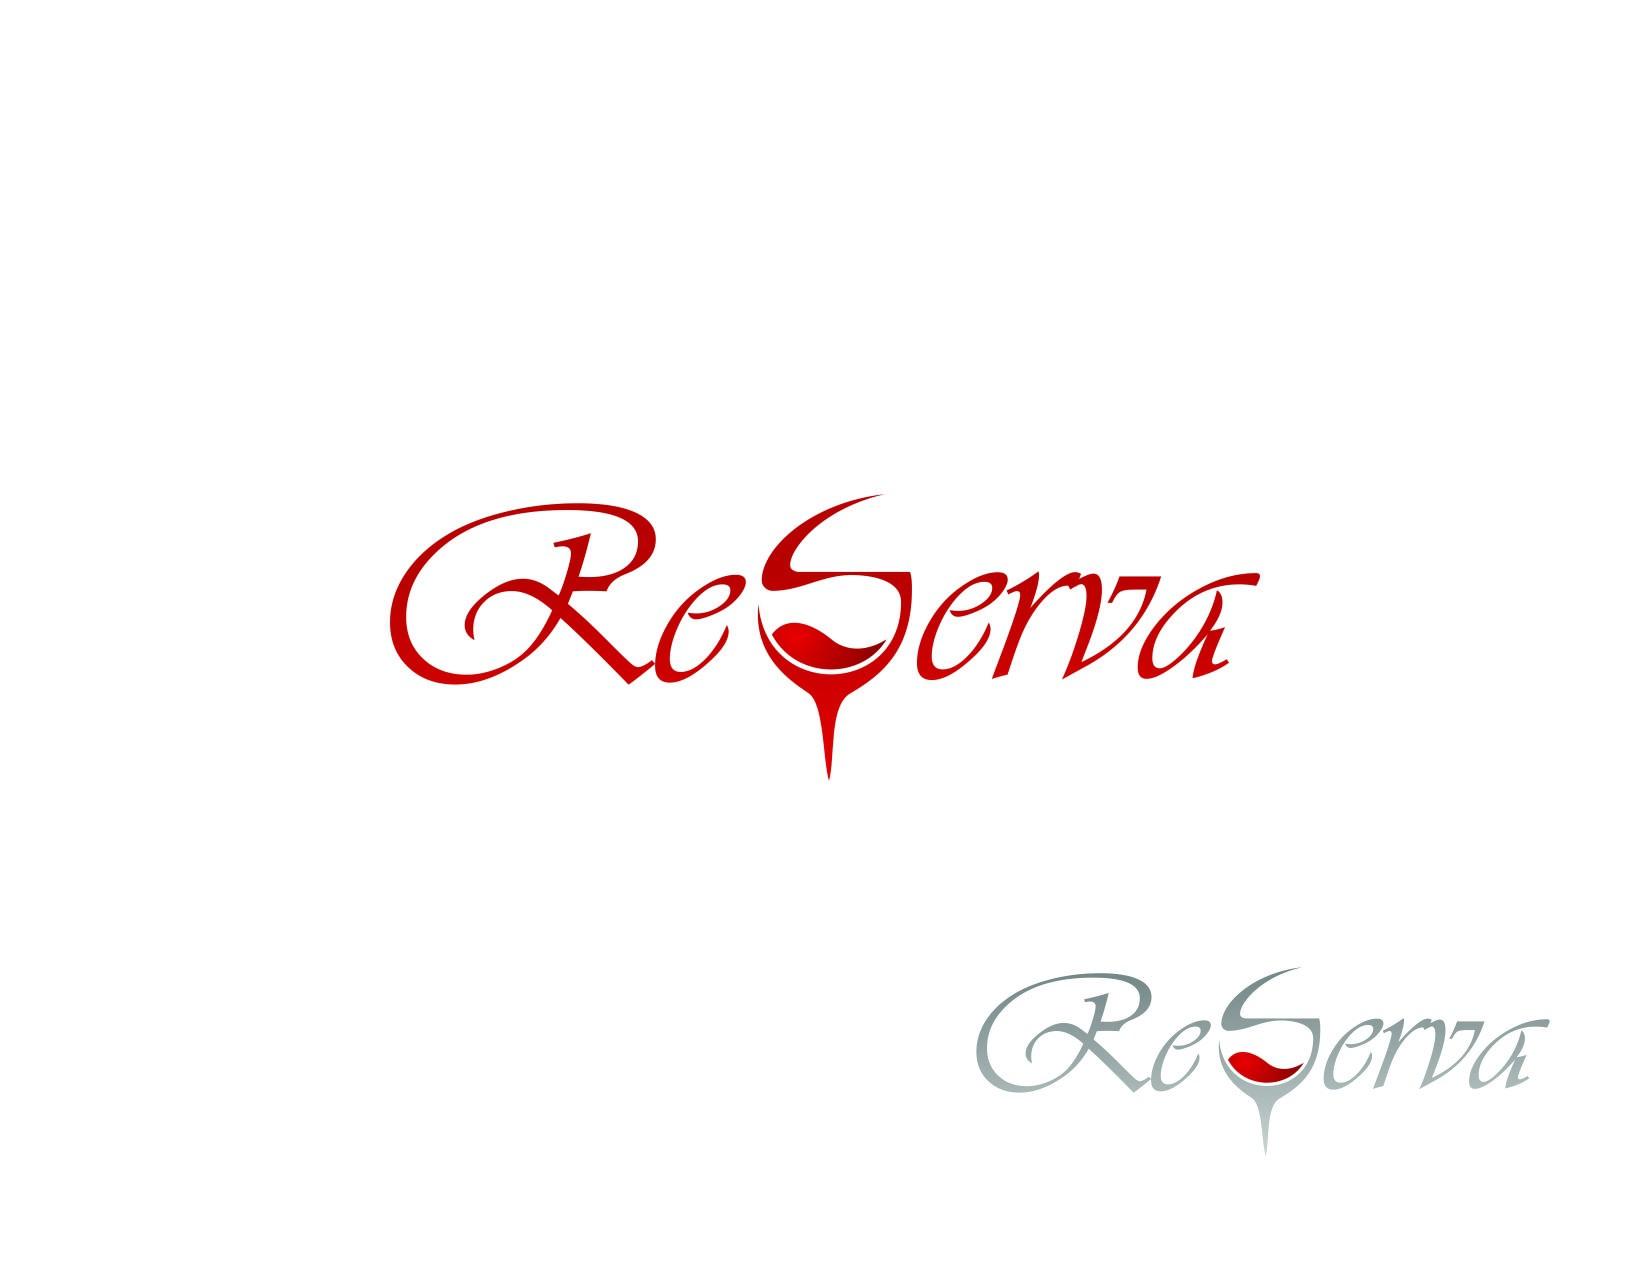 Reserva needs a new logo